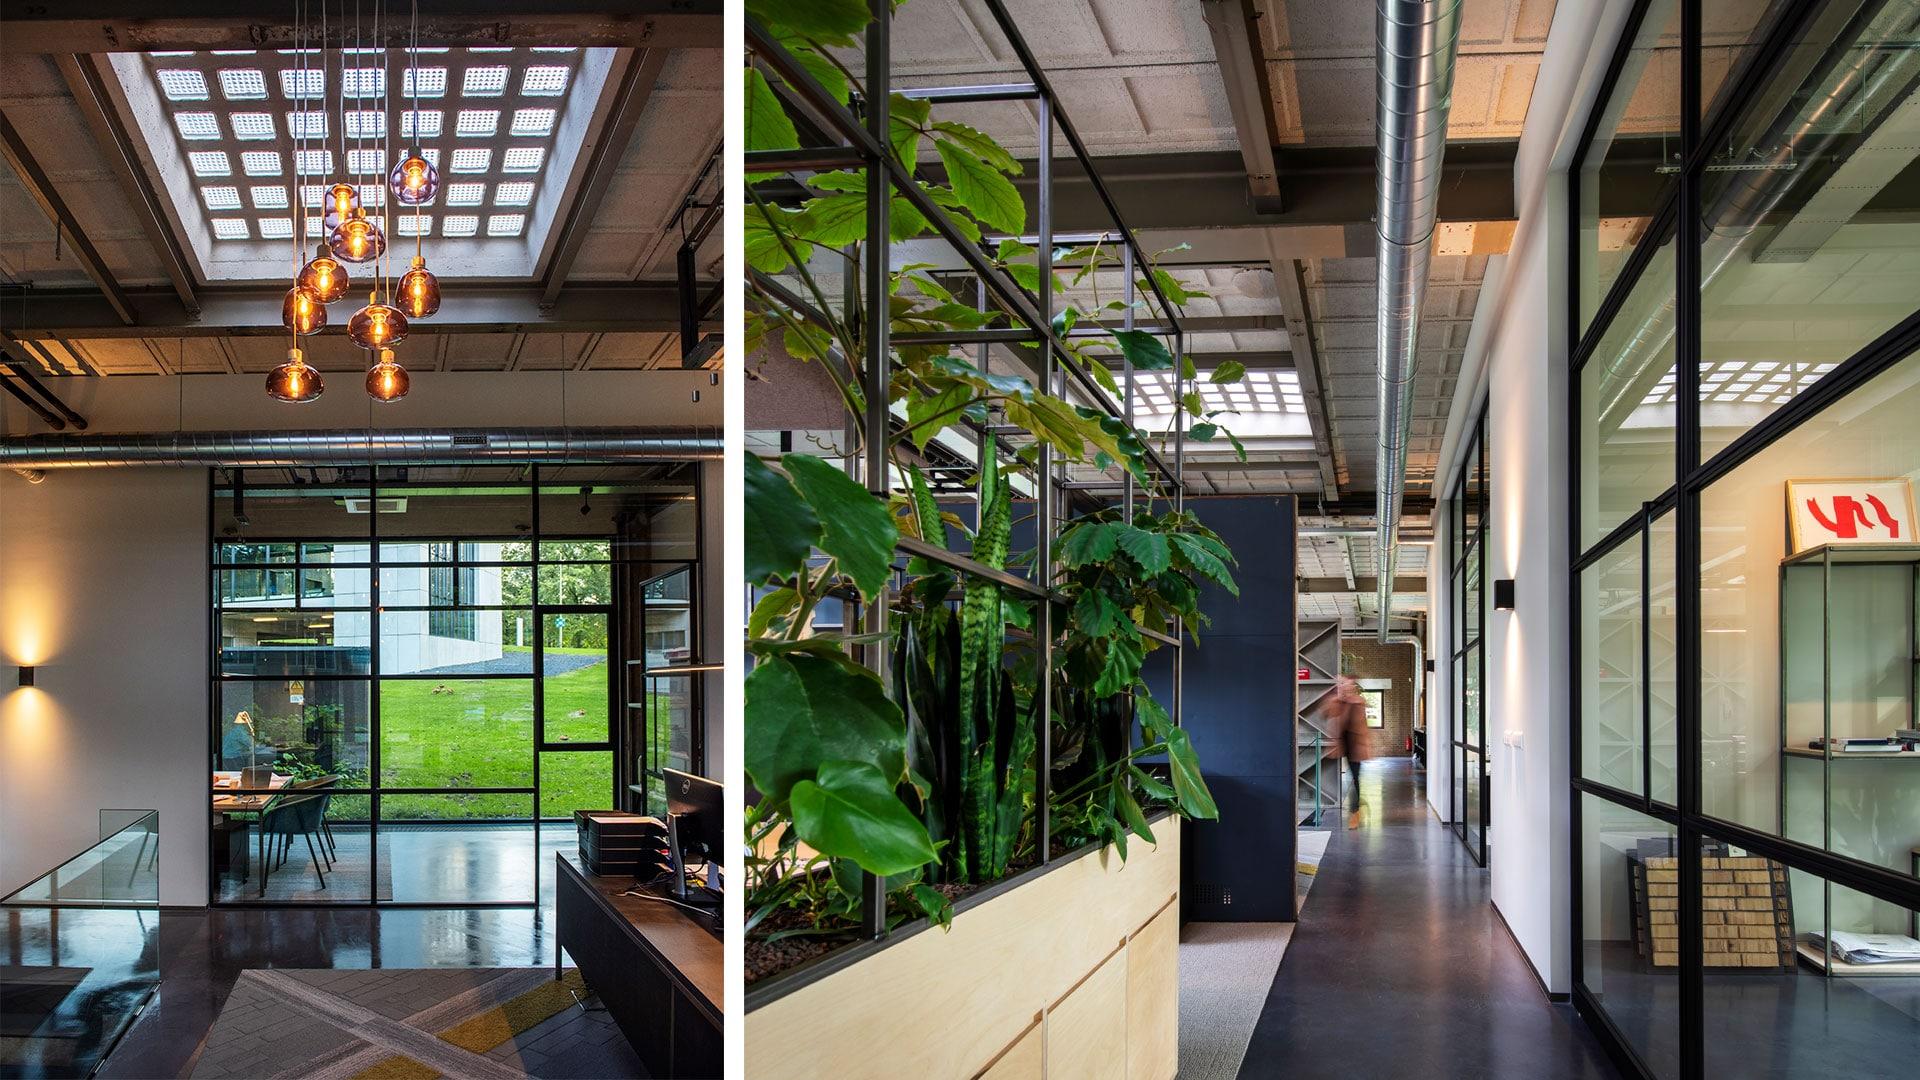 Arnhems-Buiten_B09_Weusten-Liedenbaum-Architecten_interieur-2